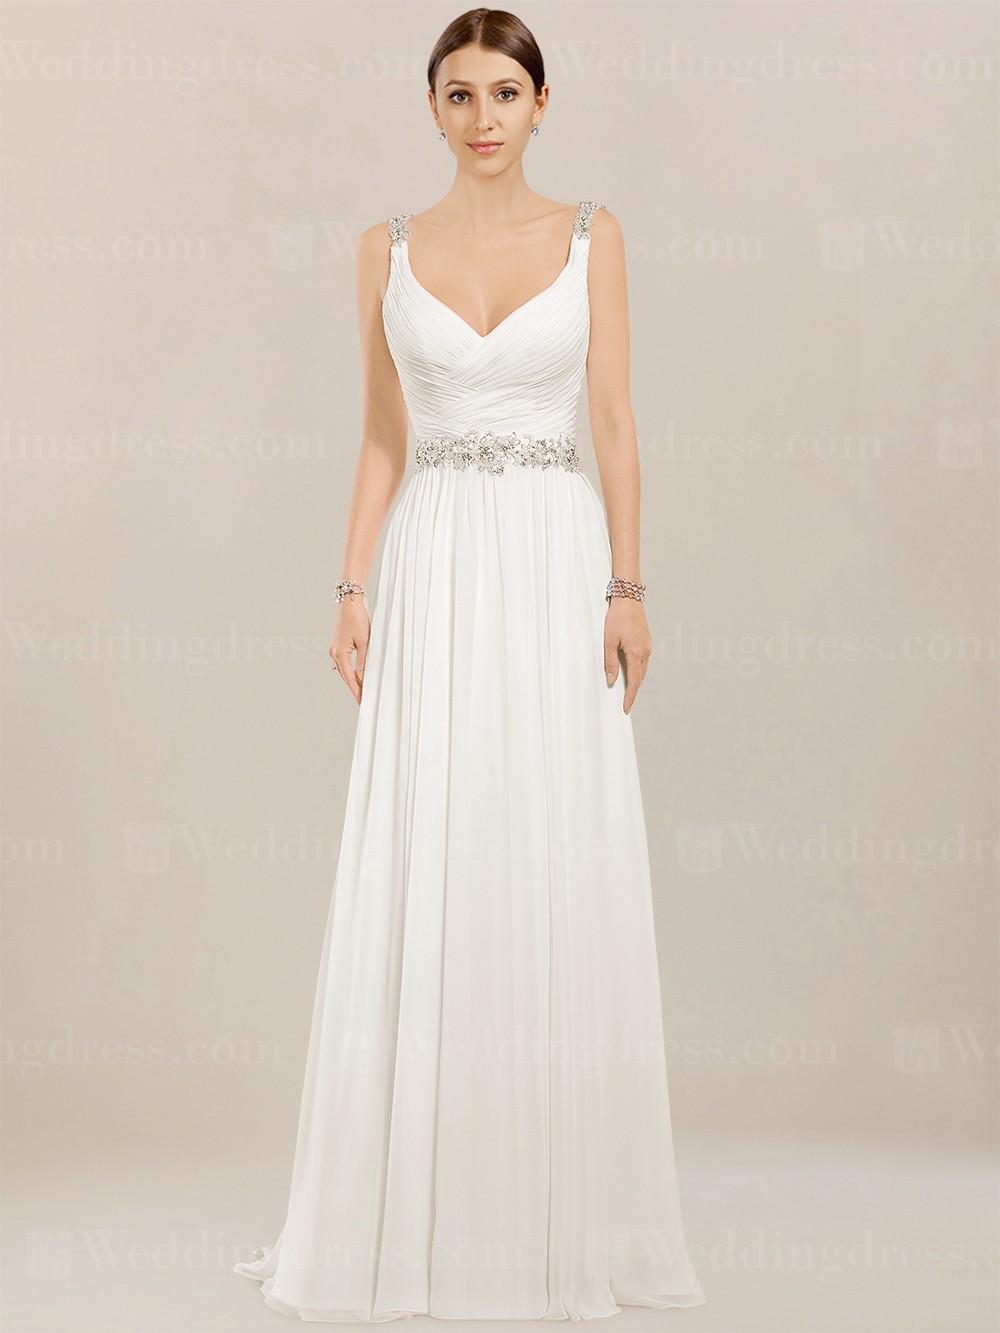 beach wedding dress beach wedding dress ... TQNGZIM